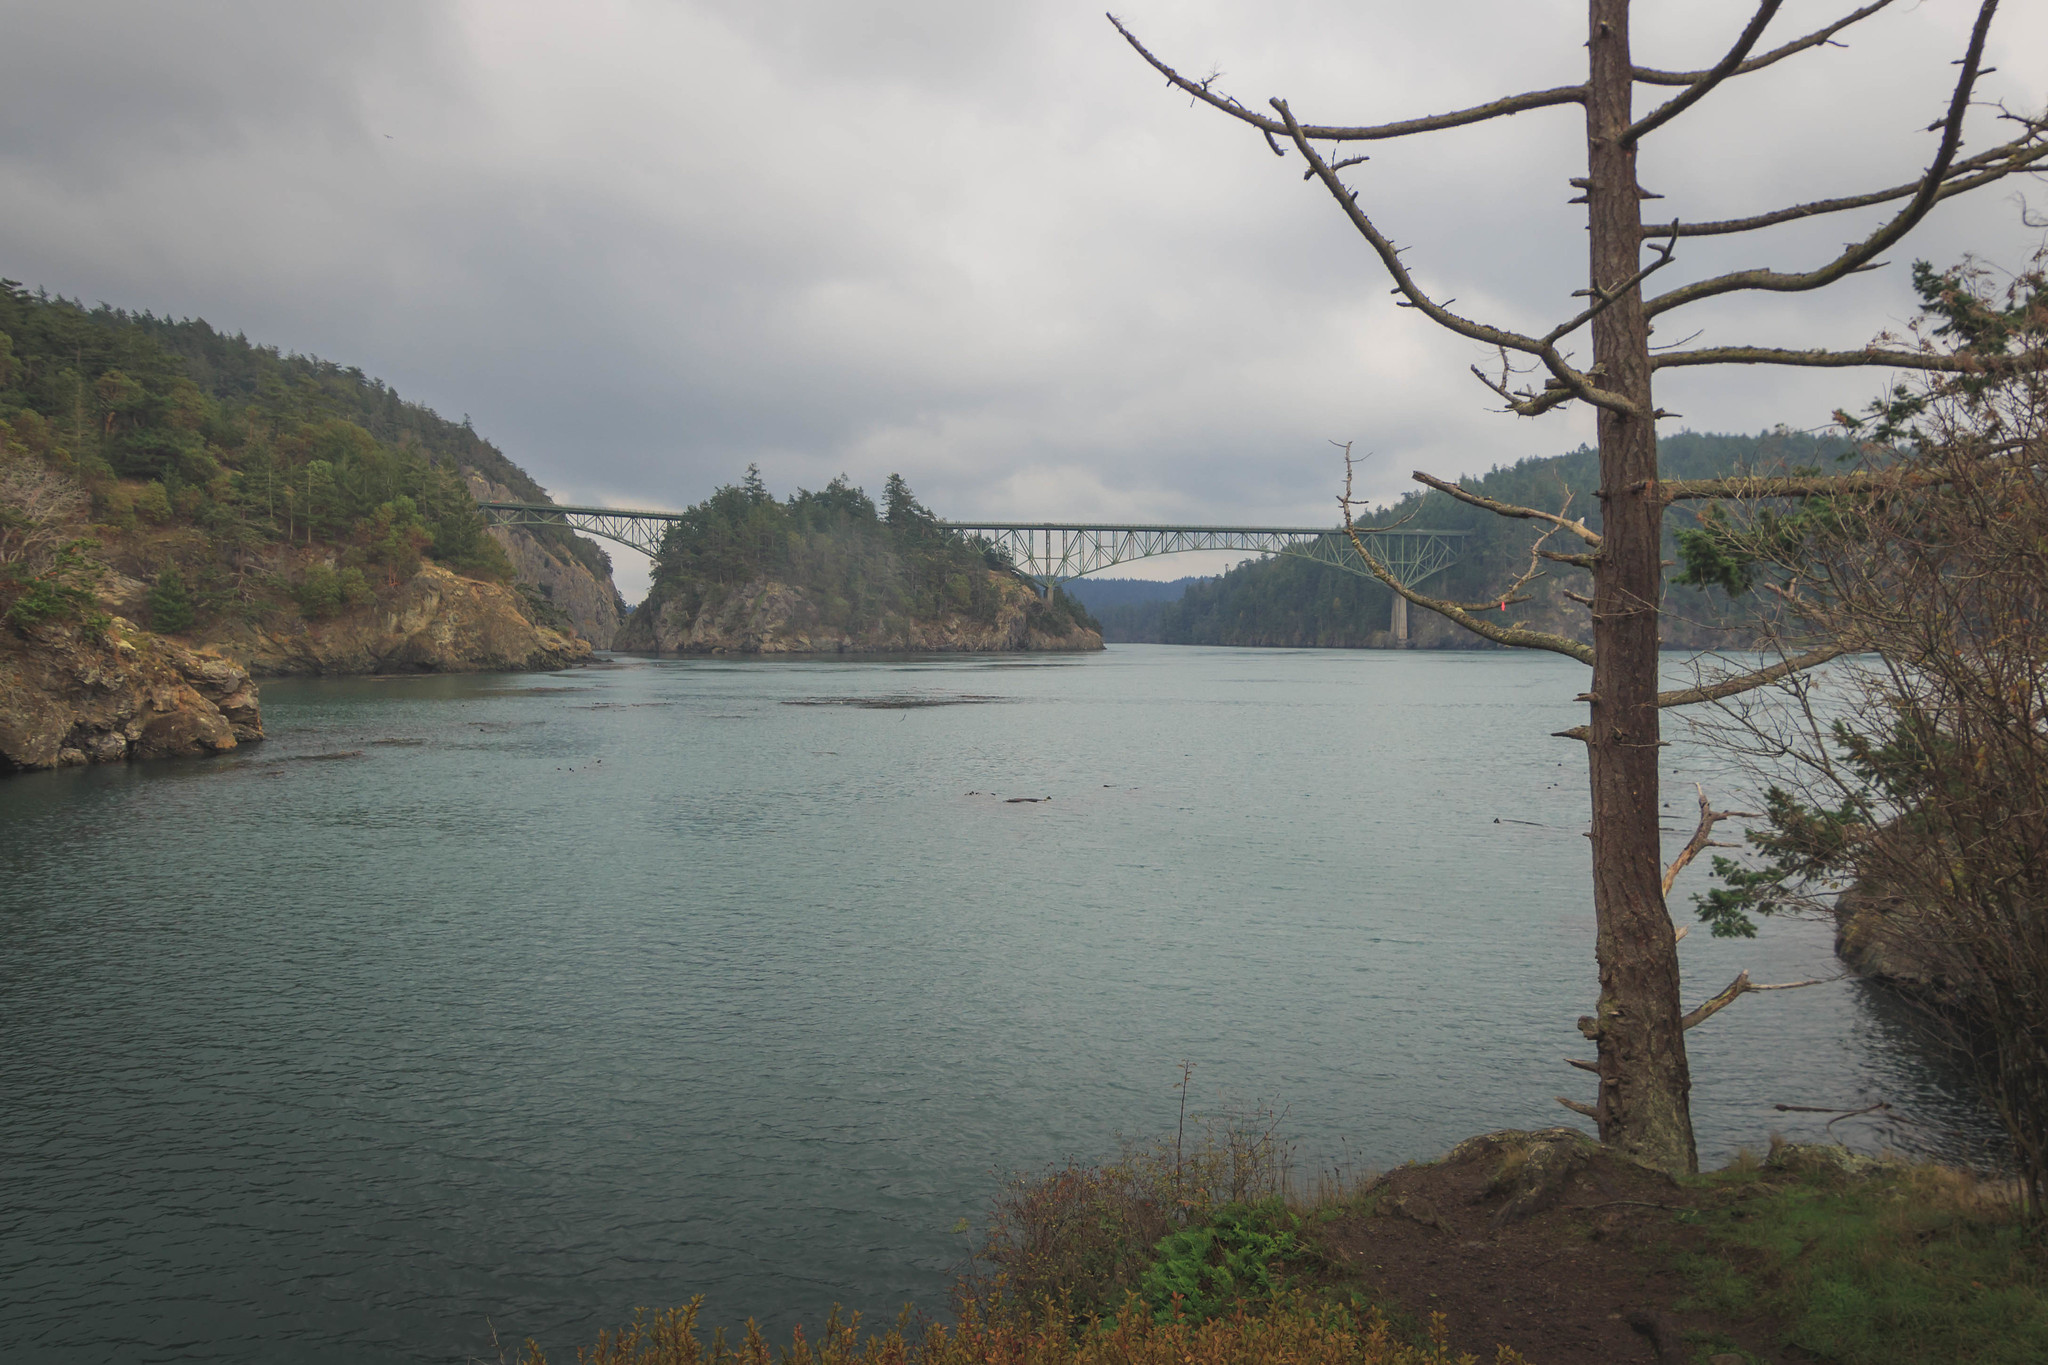 Two pass bridges